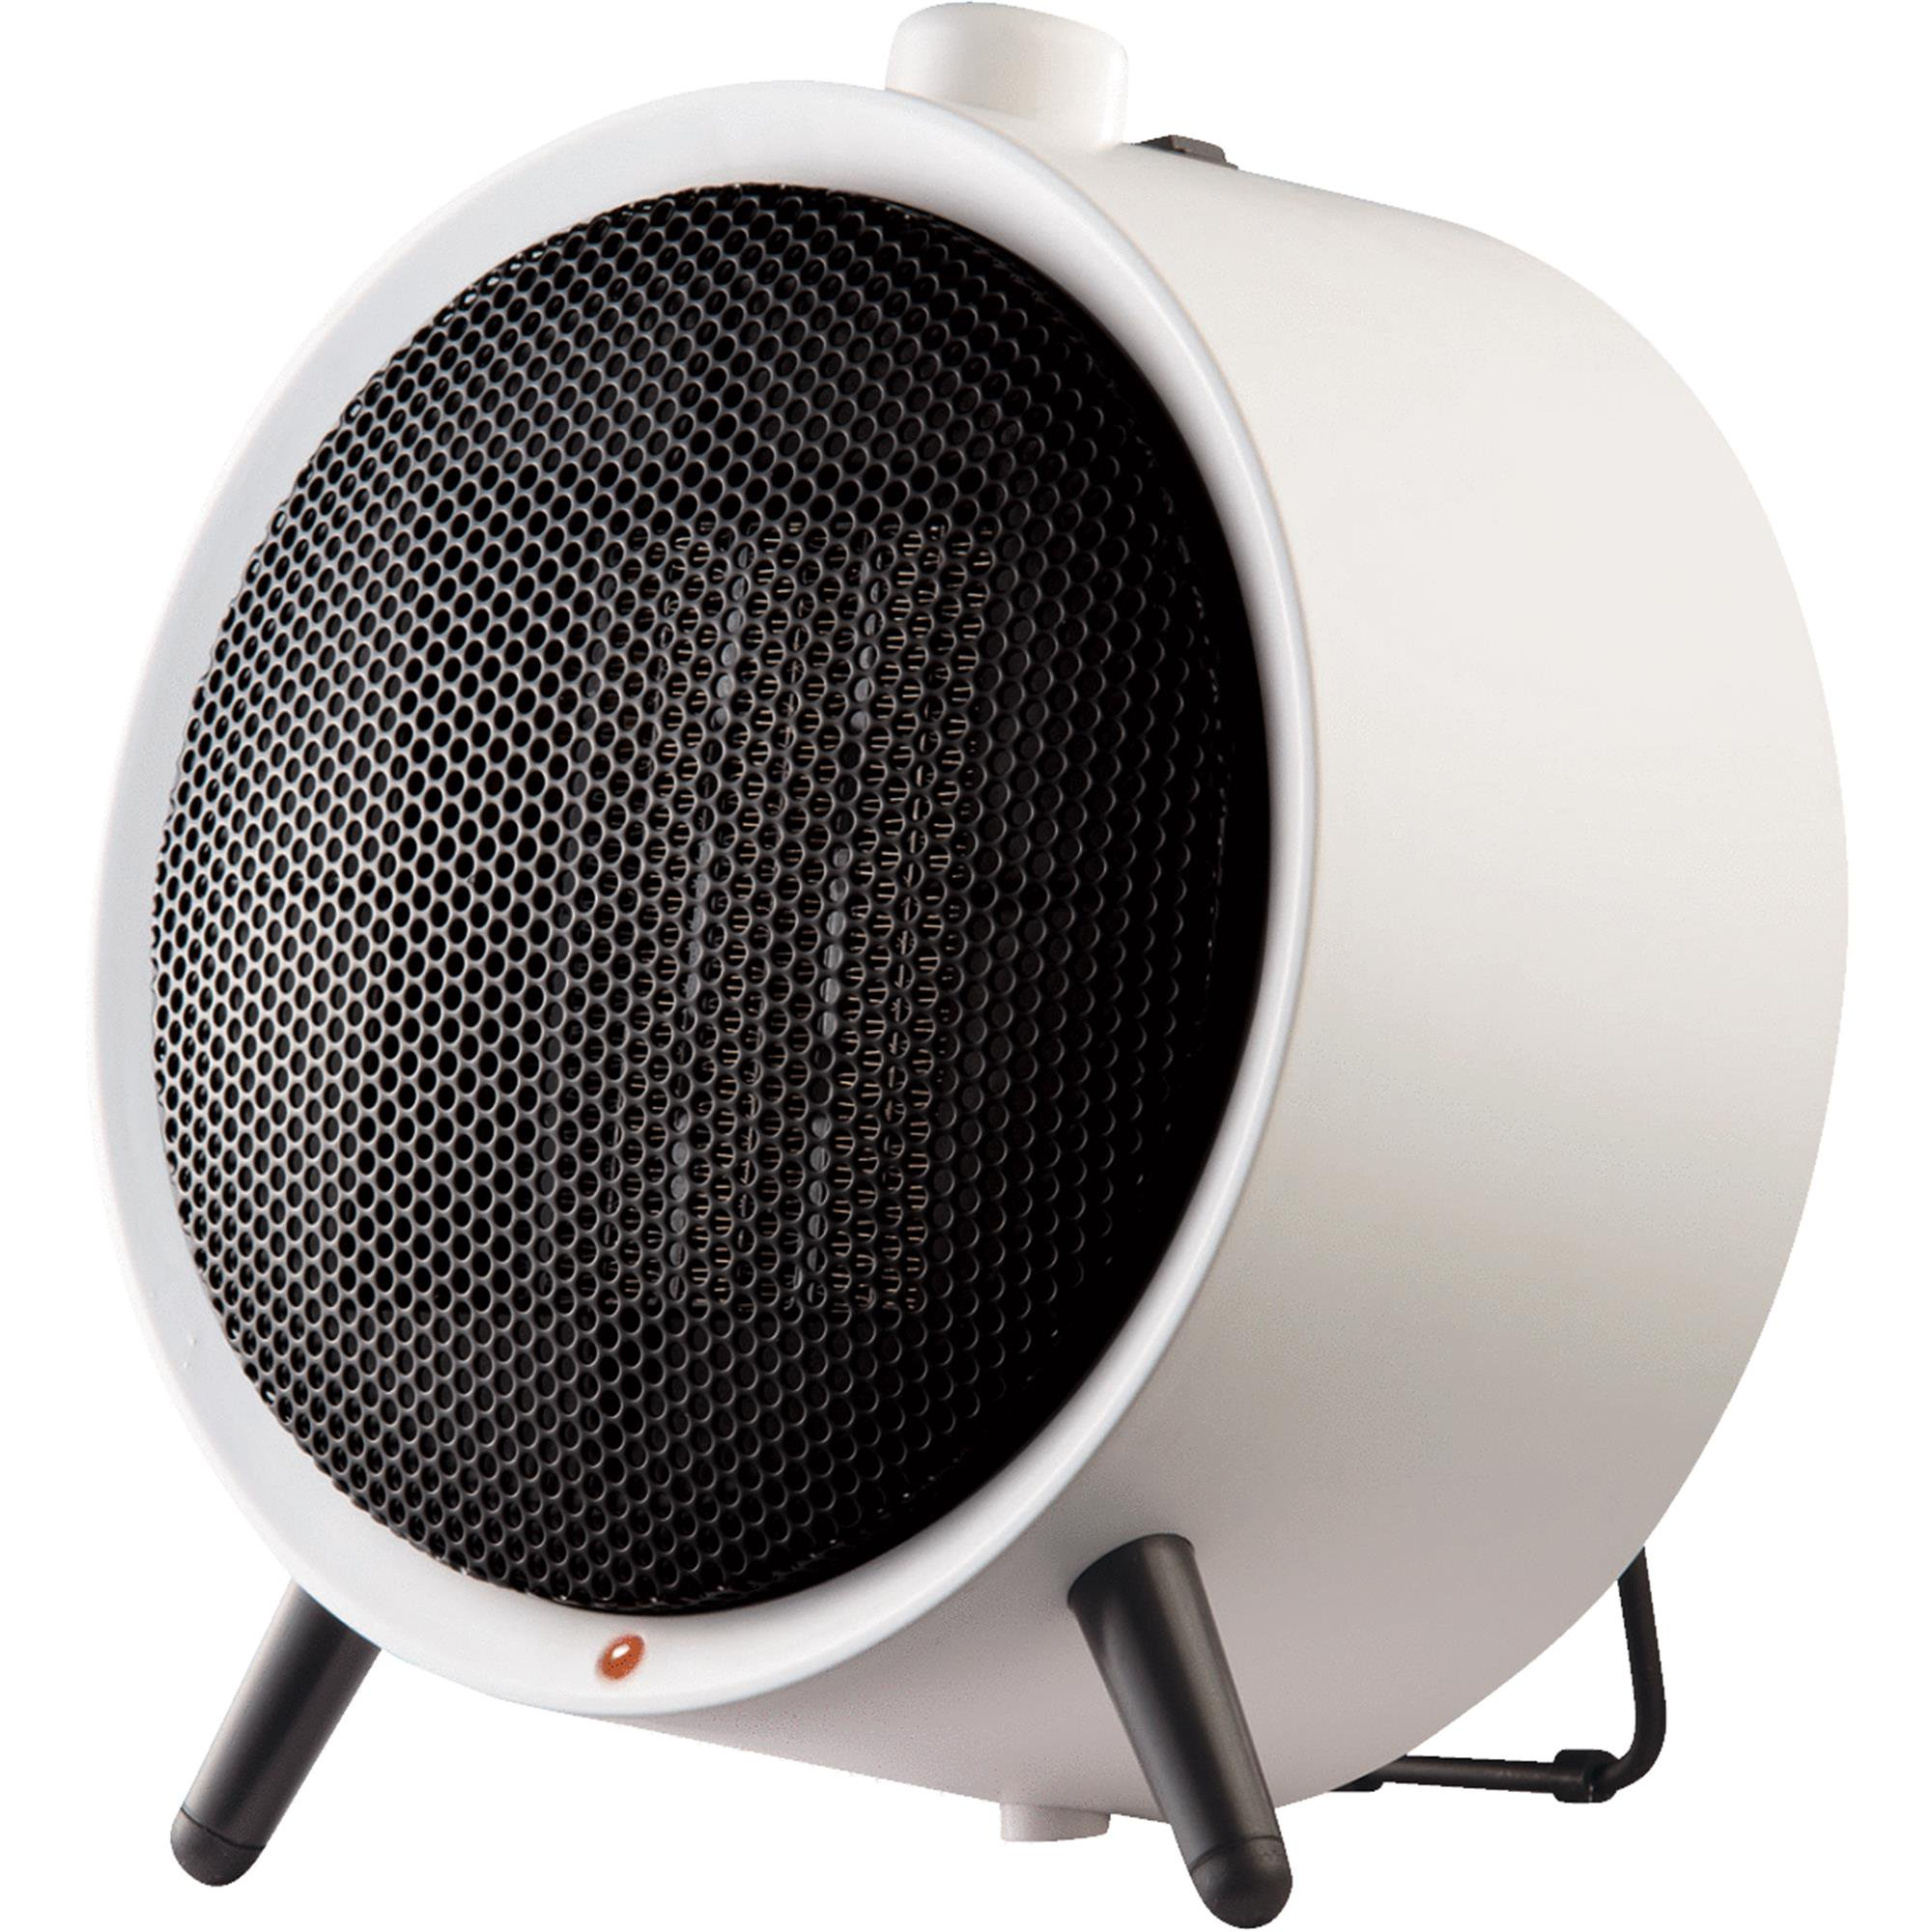 Honeywell UberHeater Ceramic Heater HCE200W, White by Kaz Home Environment